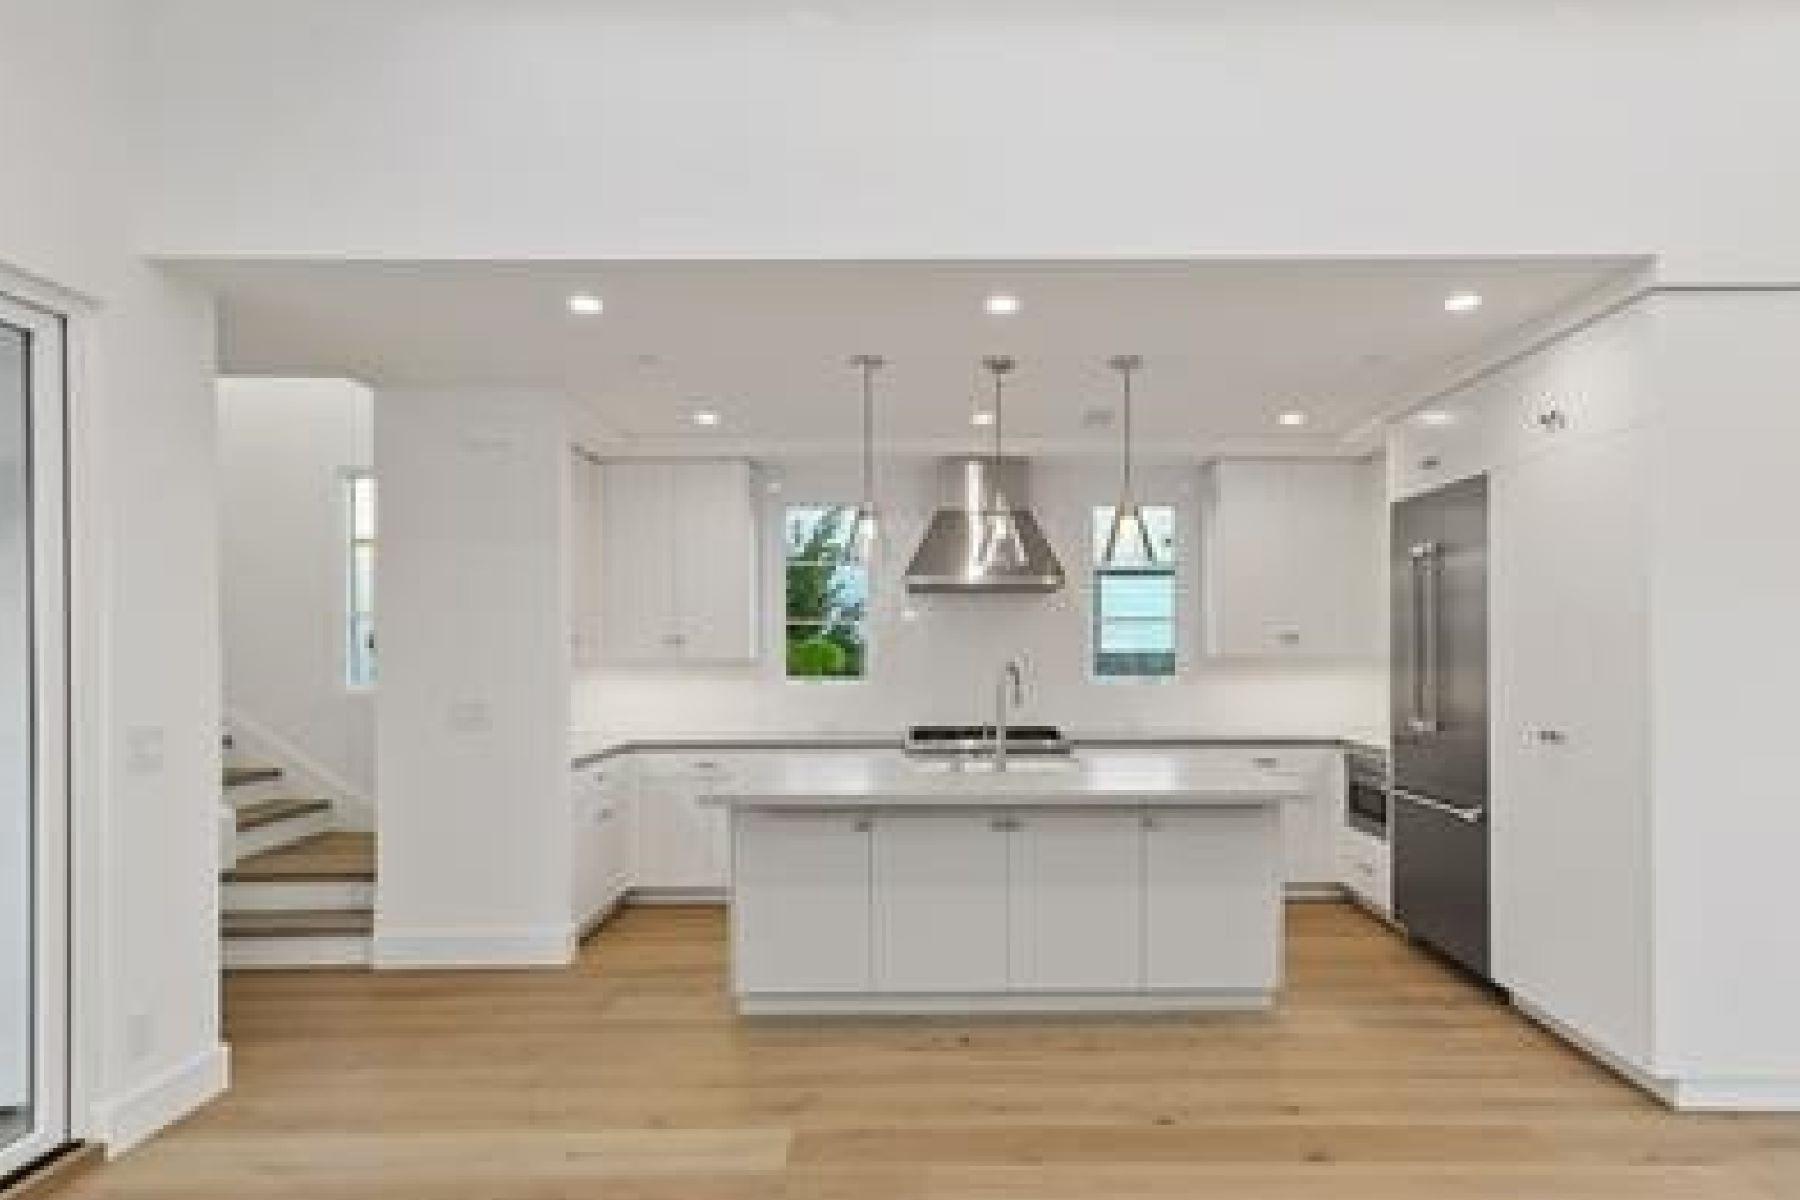 Single Family Homes for Active at 606 .5 Larkspur Avenue Corona Del Mar, California 92625 United States